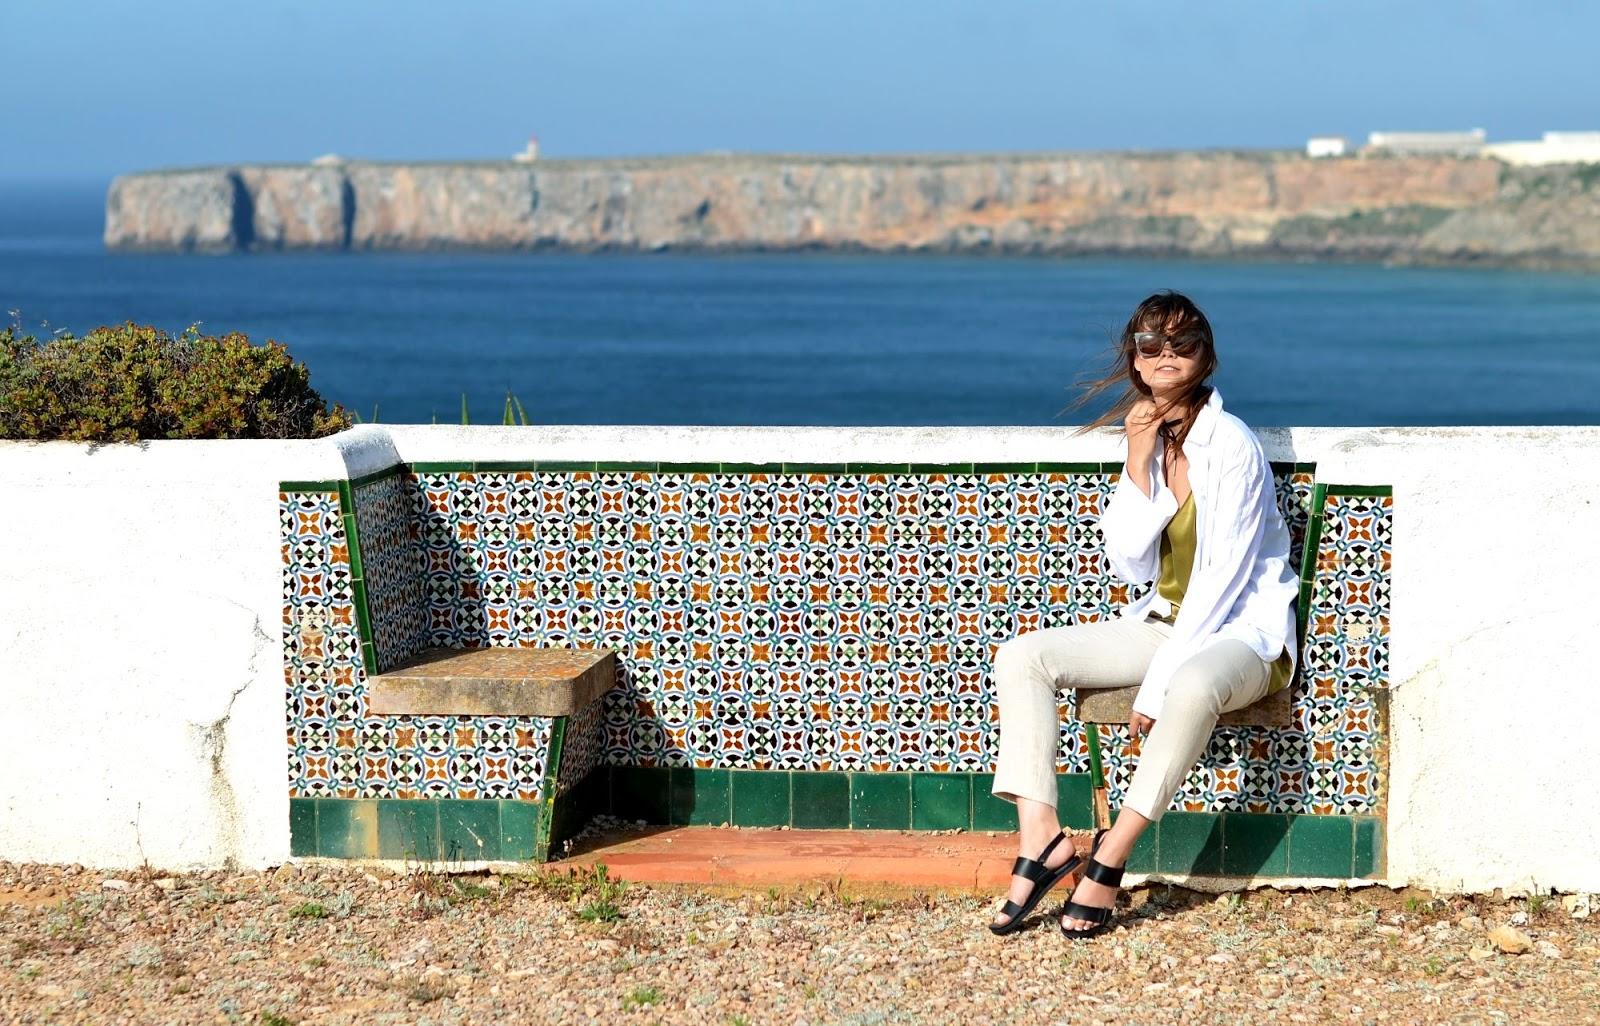 blog o modzie | blogerka modowa | styl | psychologia | strefa komfortu